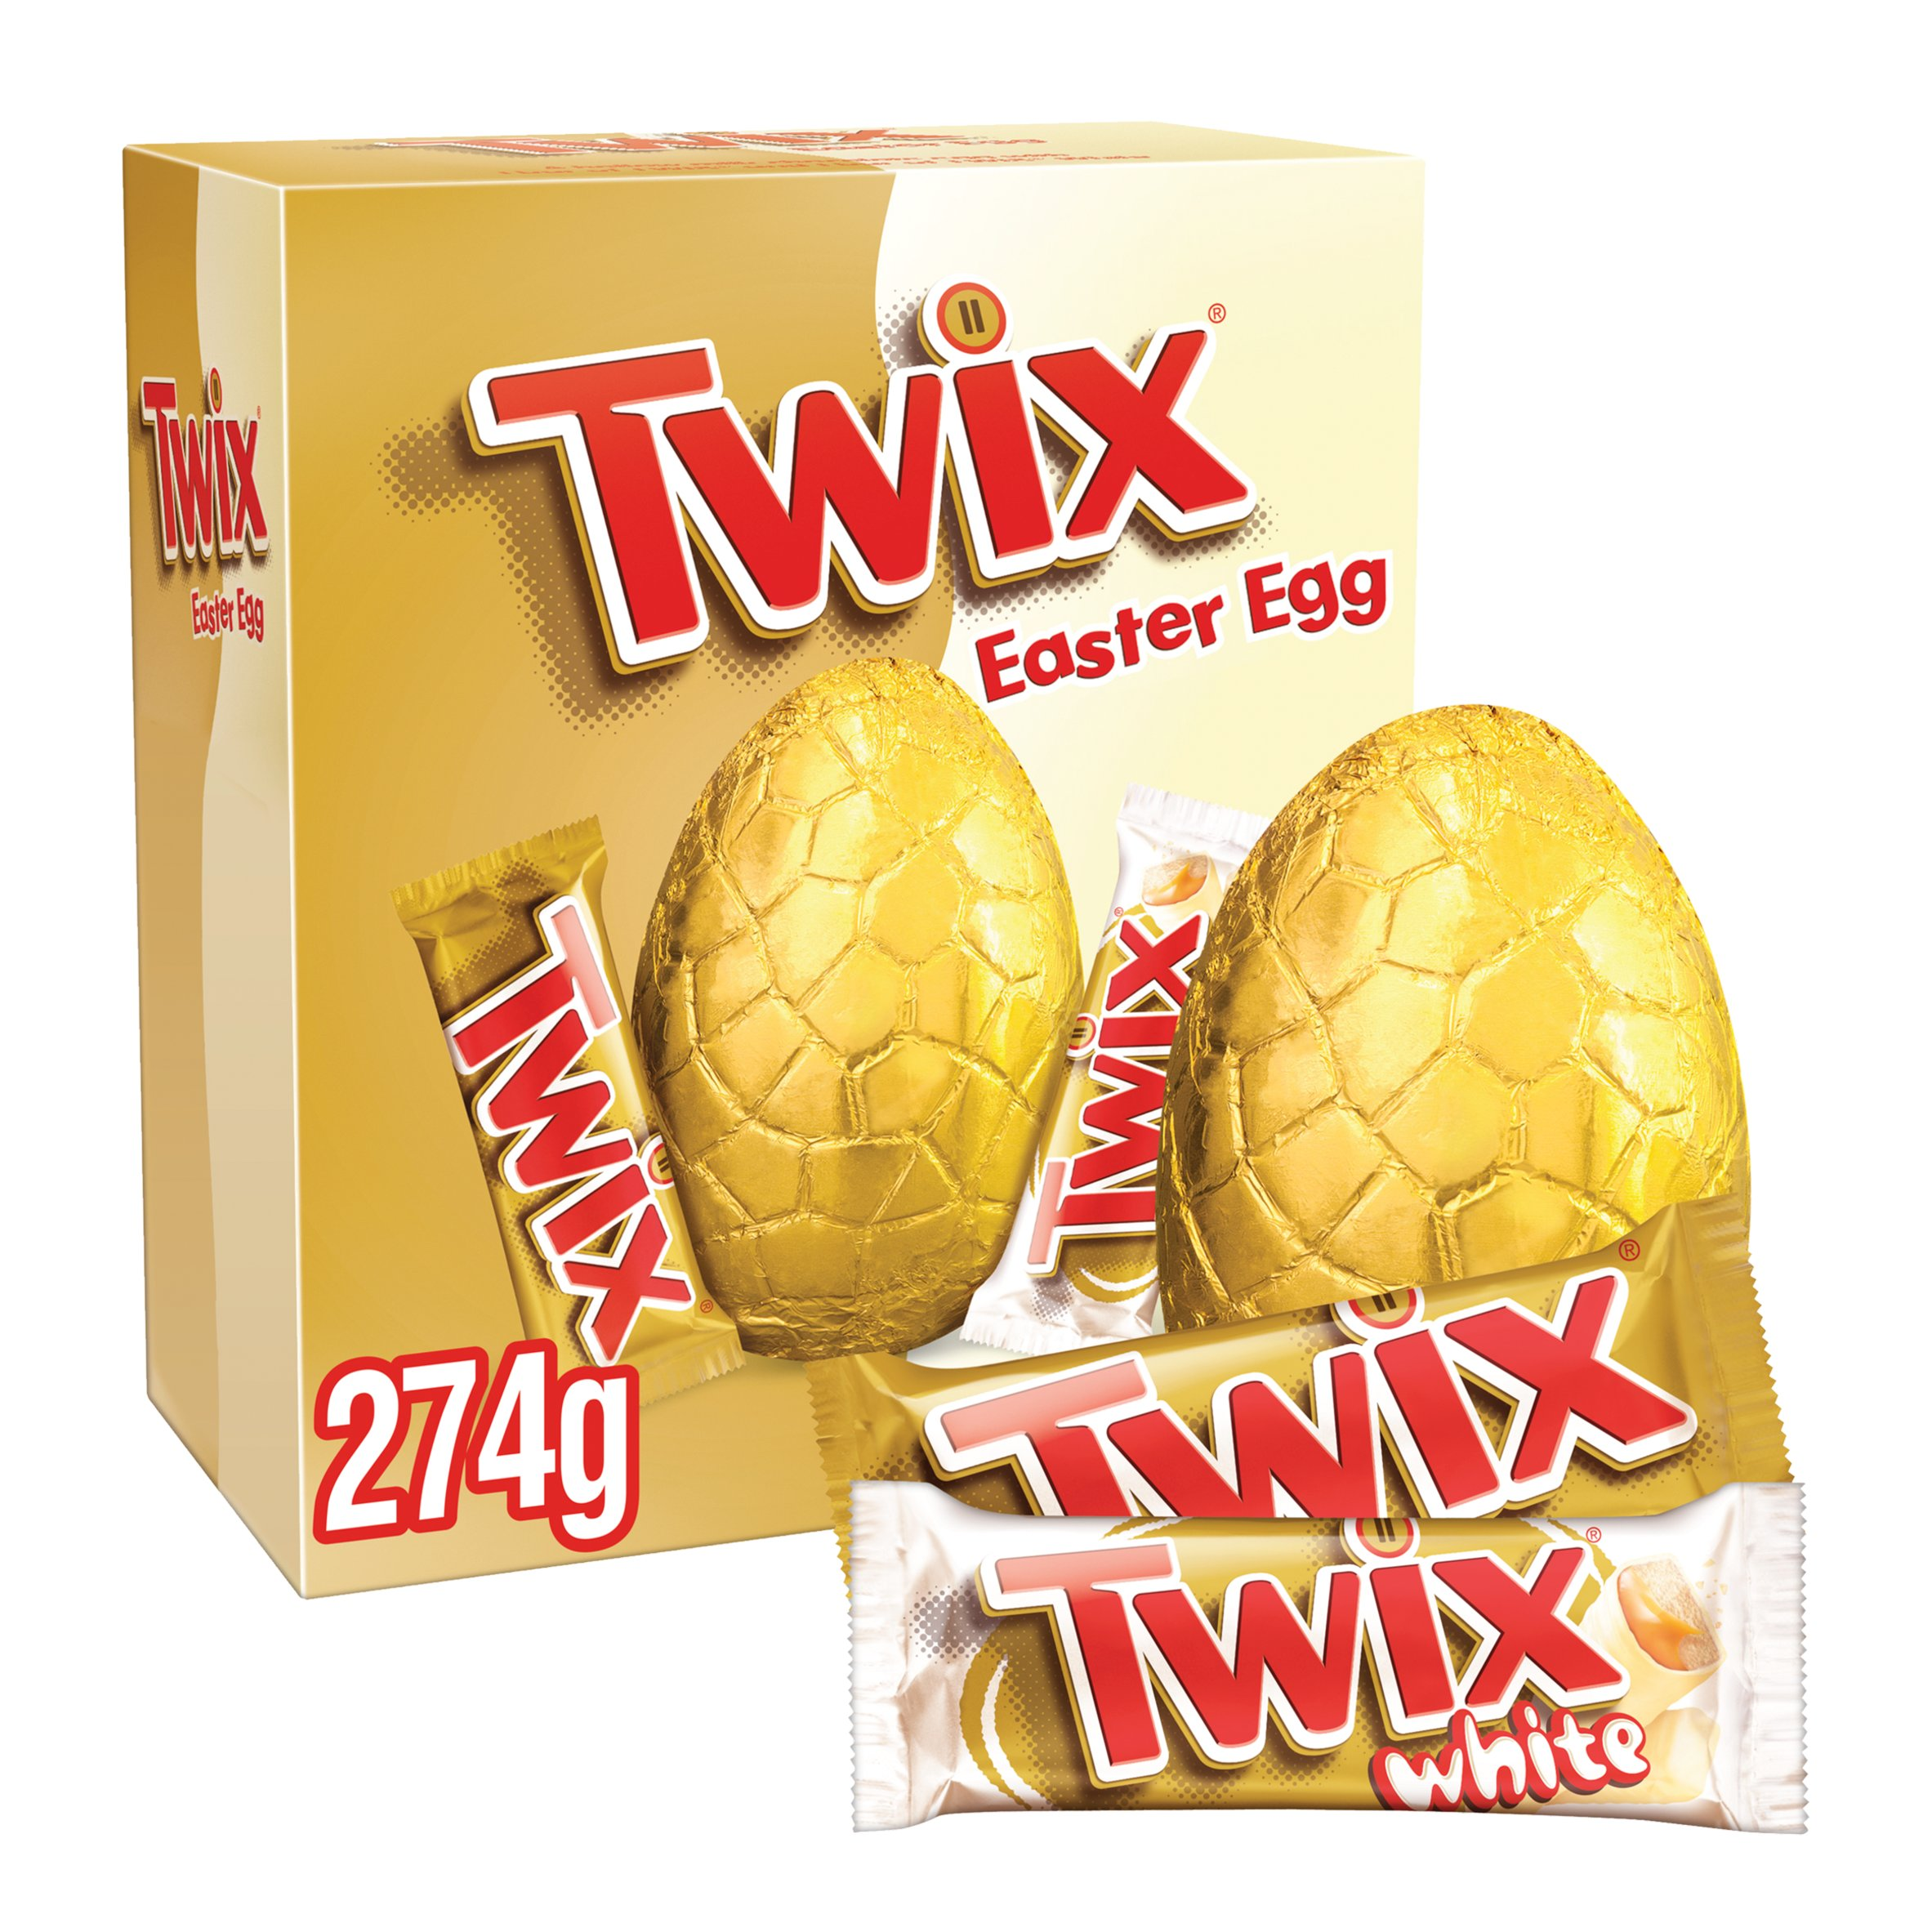 image 1 of Twix Large Easter Egg 274G